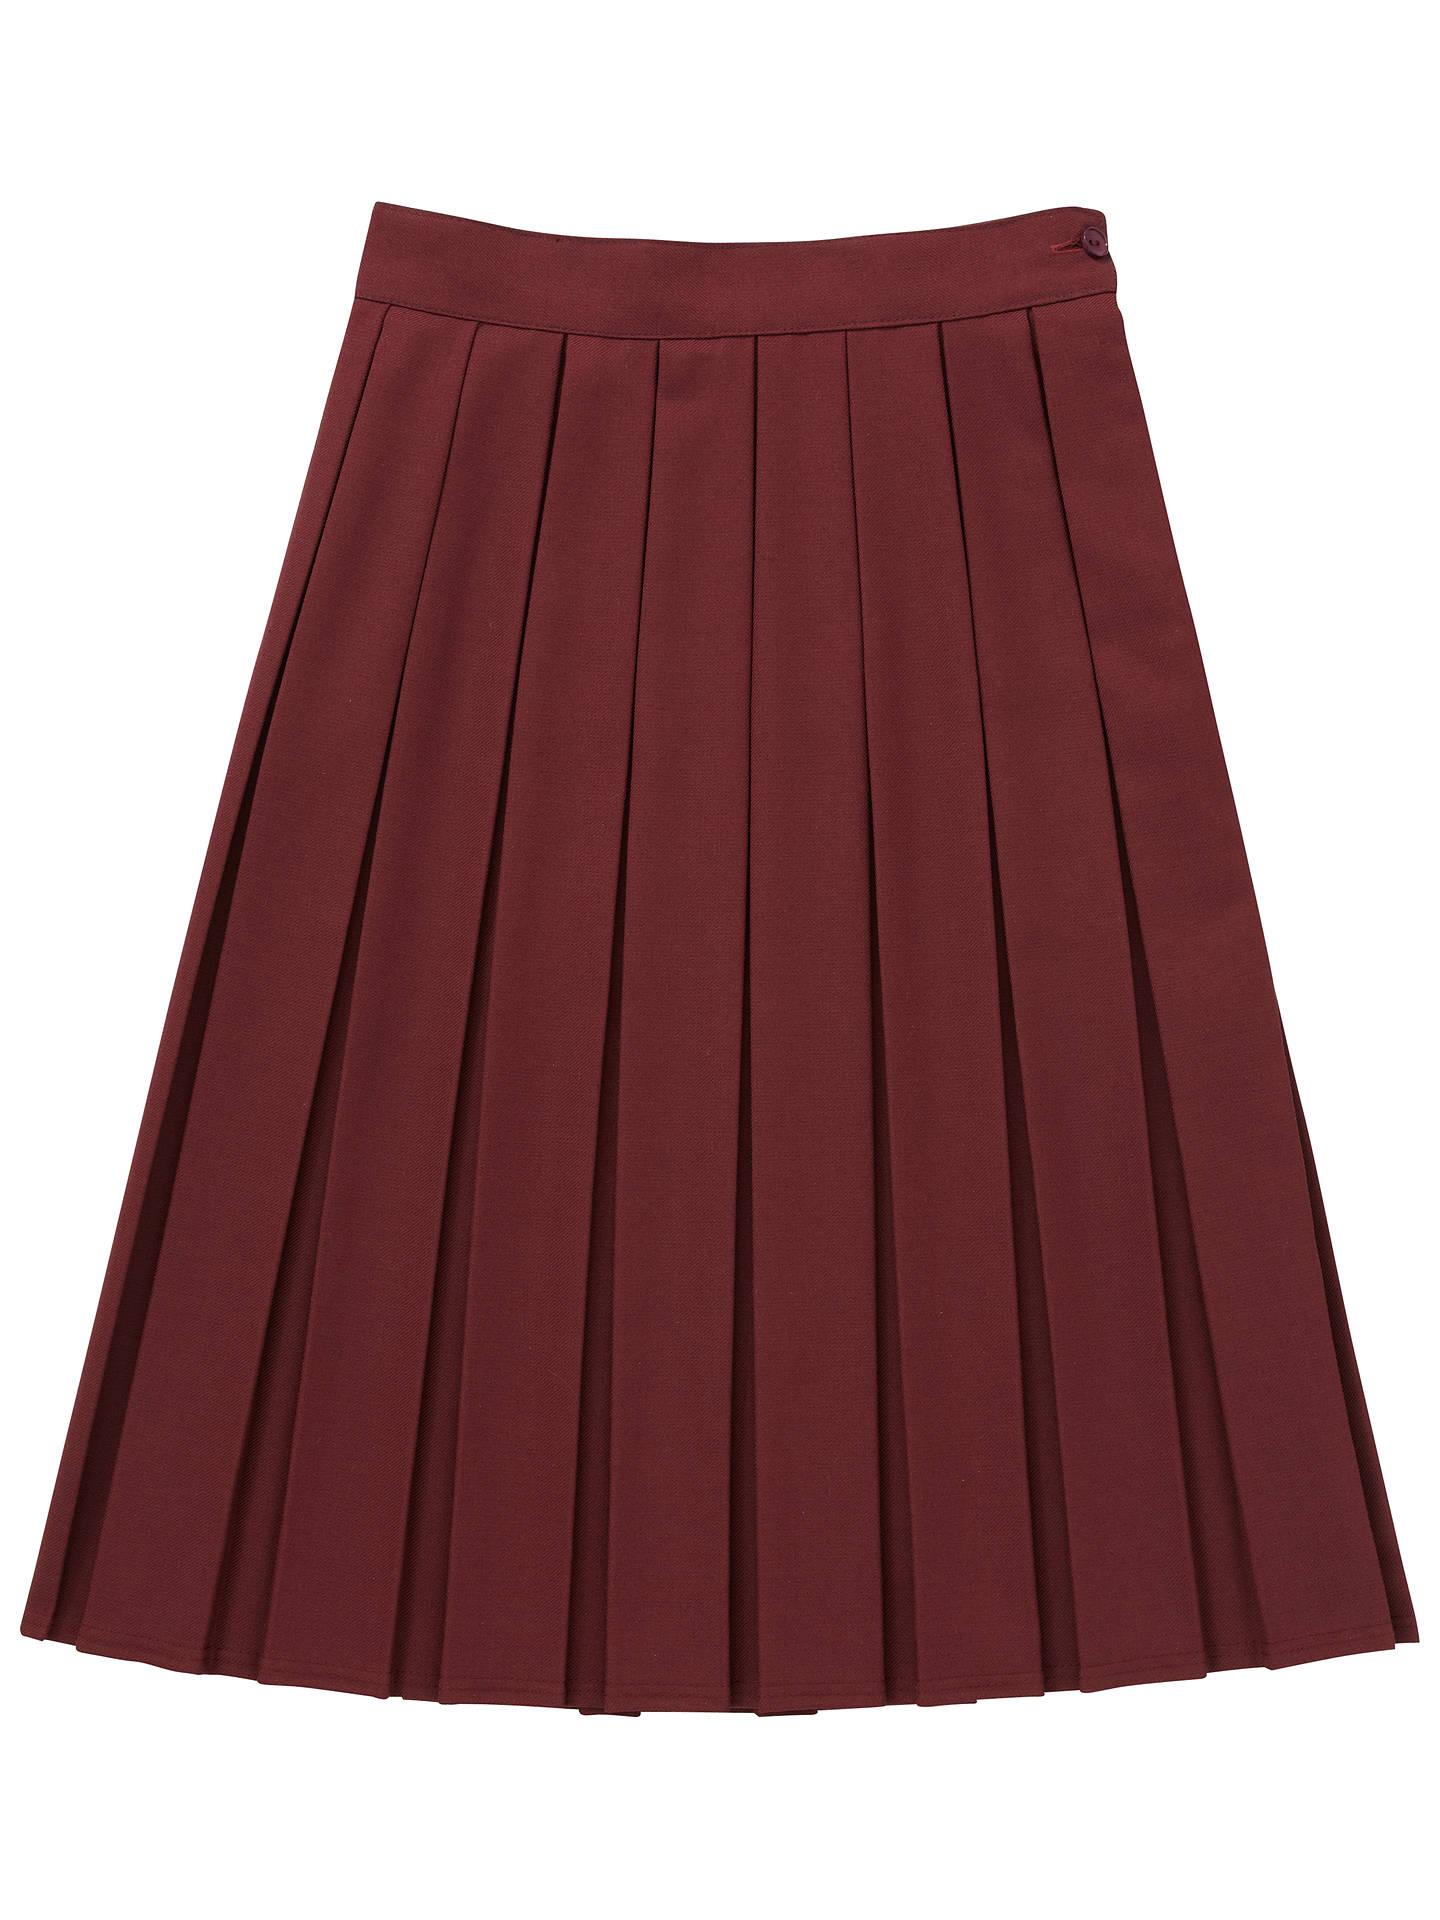 643f1dcc7 Girls' School Box Pleat Skirt, Maroon at John Lewis & Partners